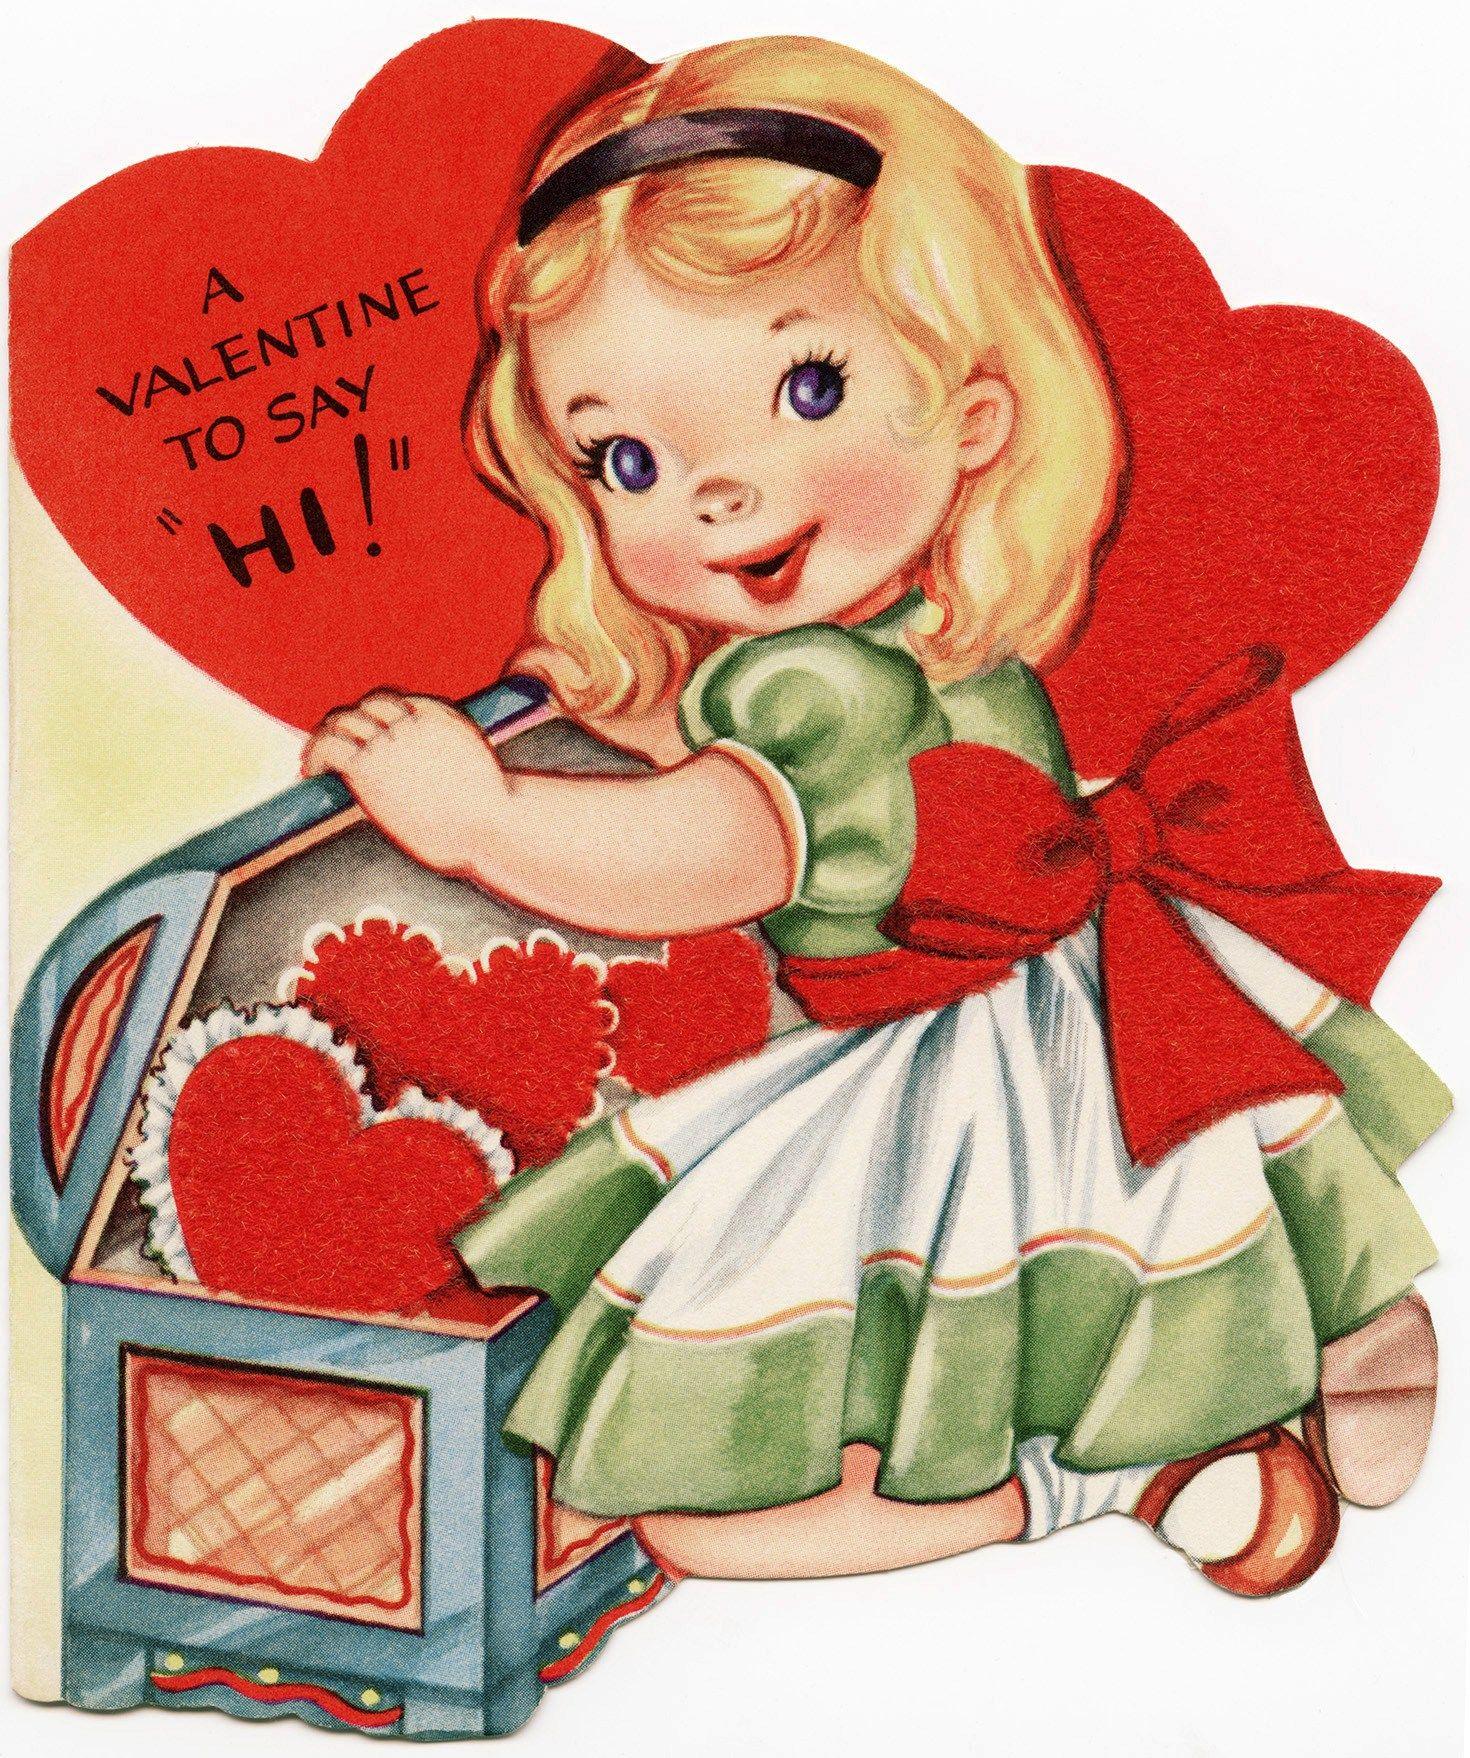 Vintage valentine free valentine graphic old fashioned greeting vintage valentine free valentine graphic old fashioned greeting card child valentine printable kristyandbryce Image collections